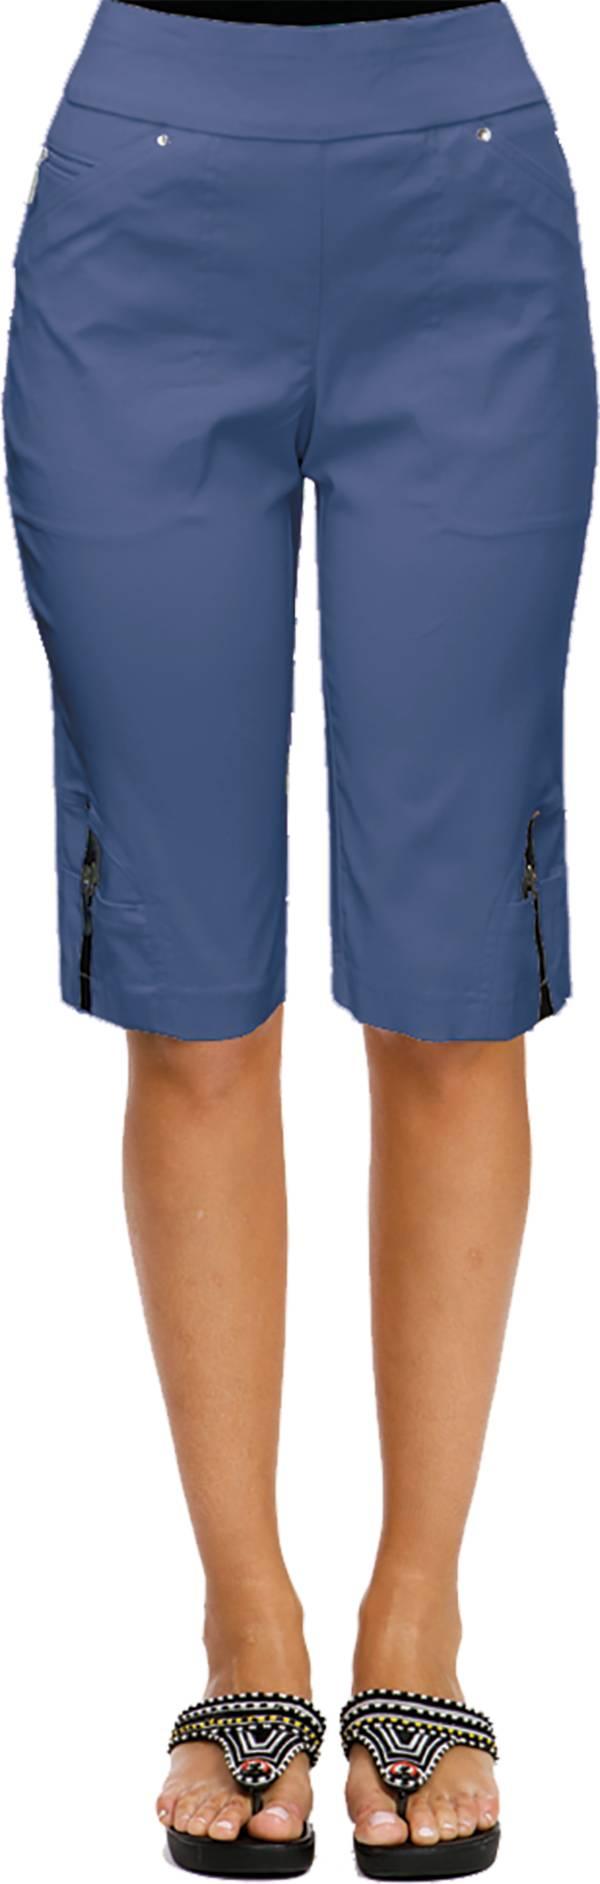 Jamie Sadock Women's Skinnyliscious Knee Golf Capris product image